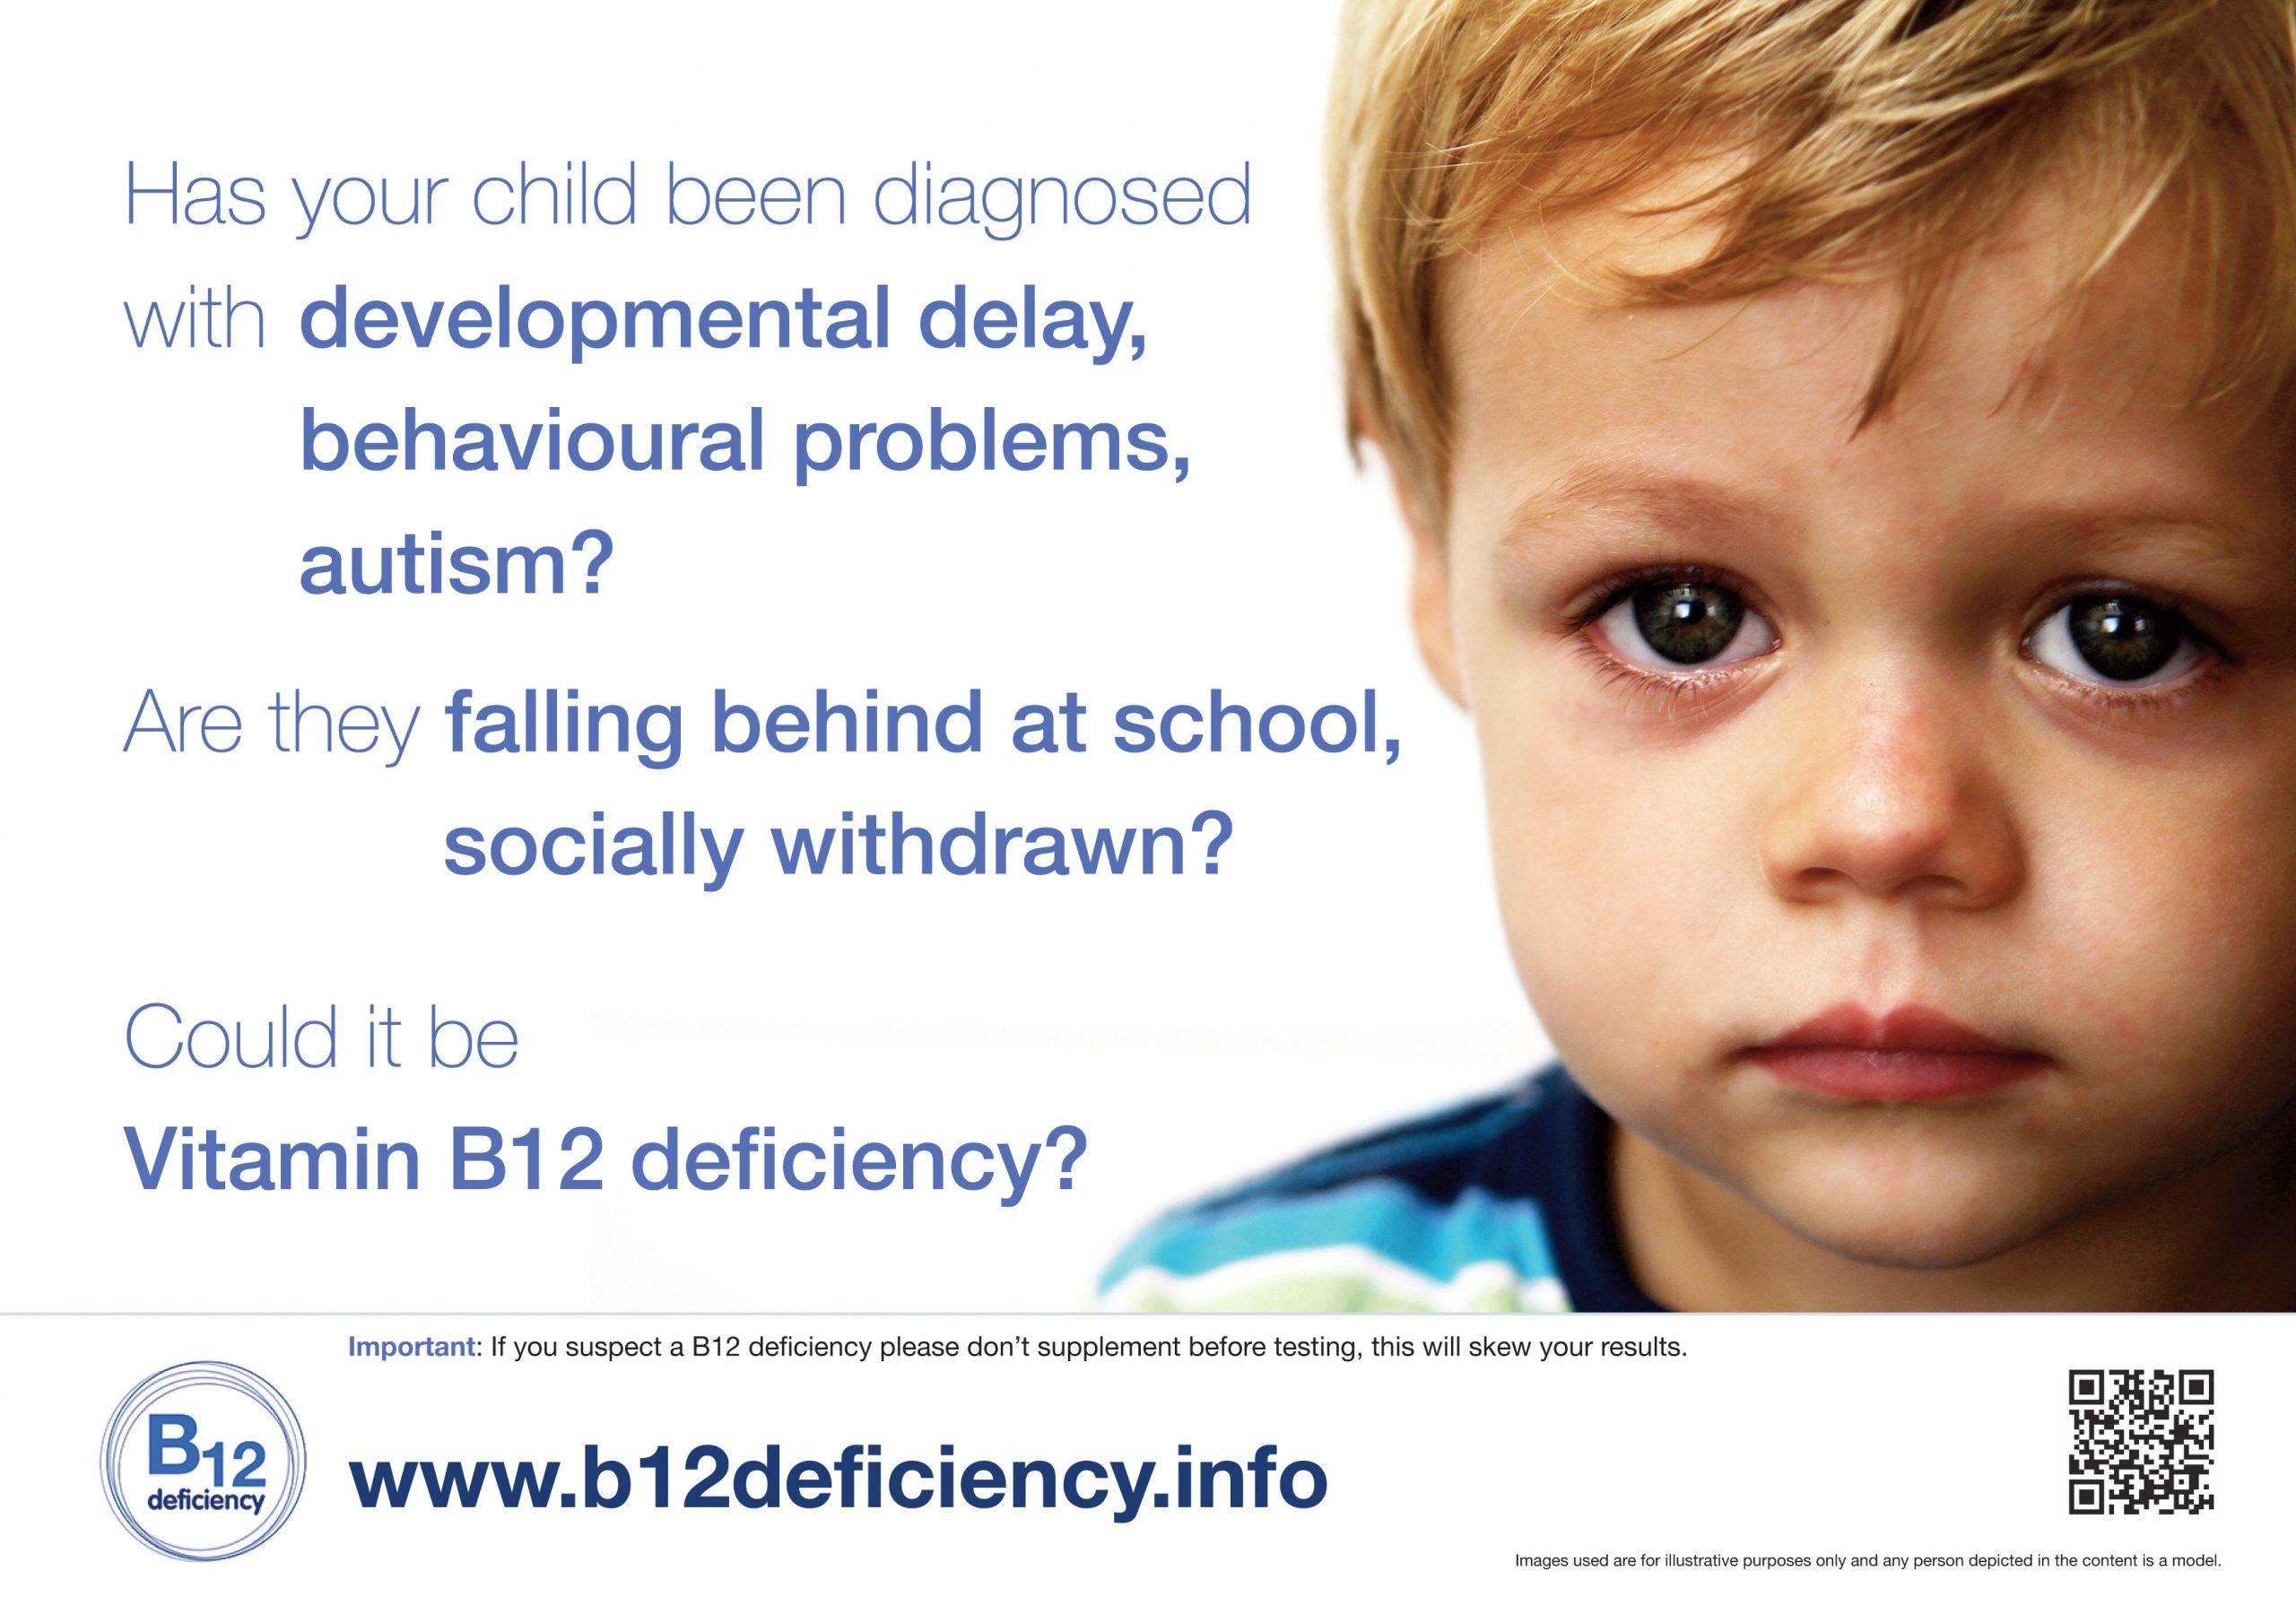 The Ignorance of Vitamin B12 Deficiency in Children